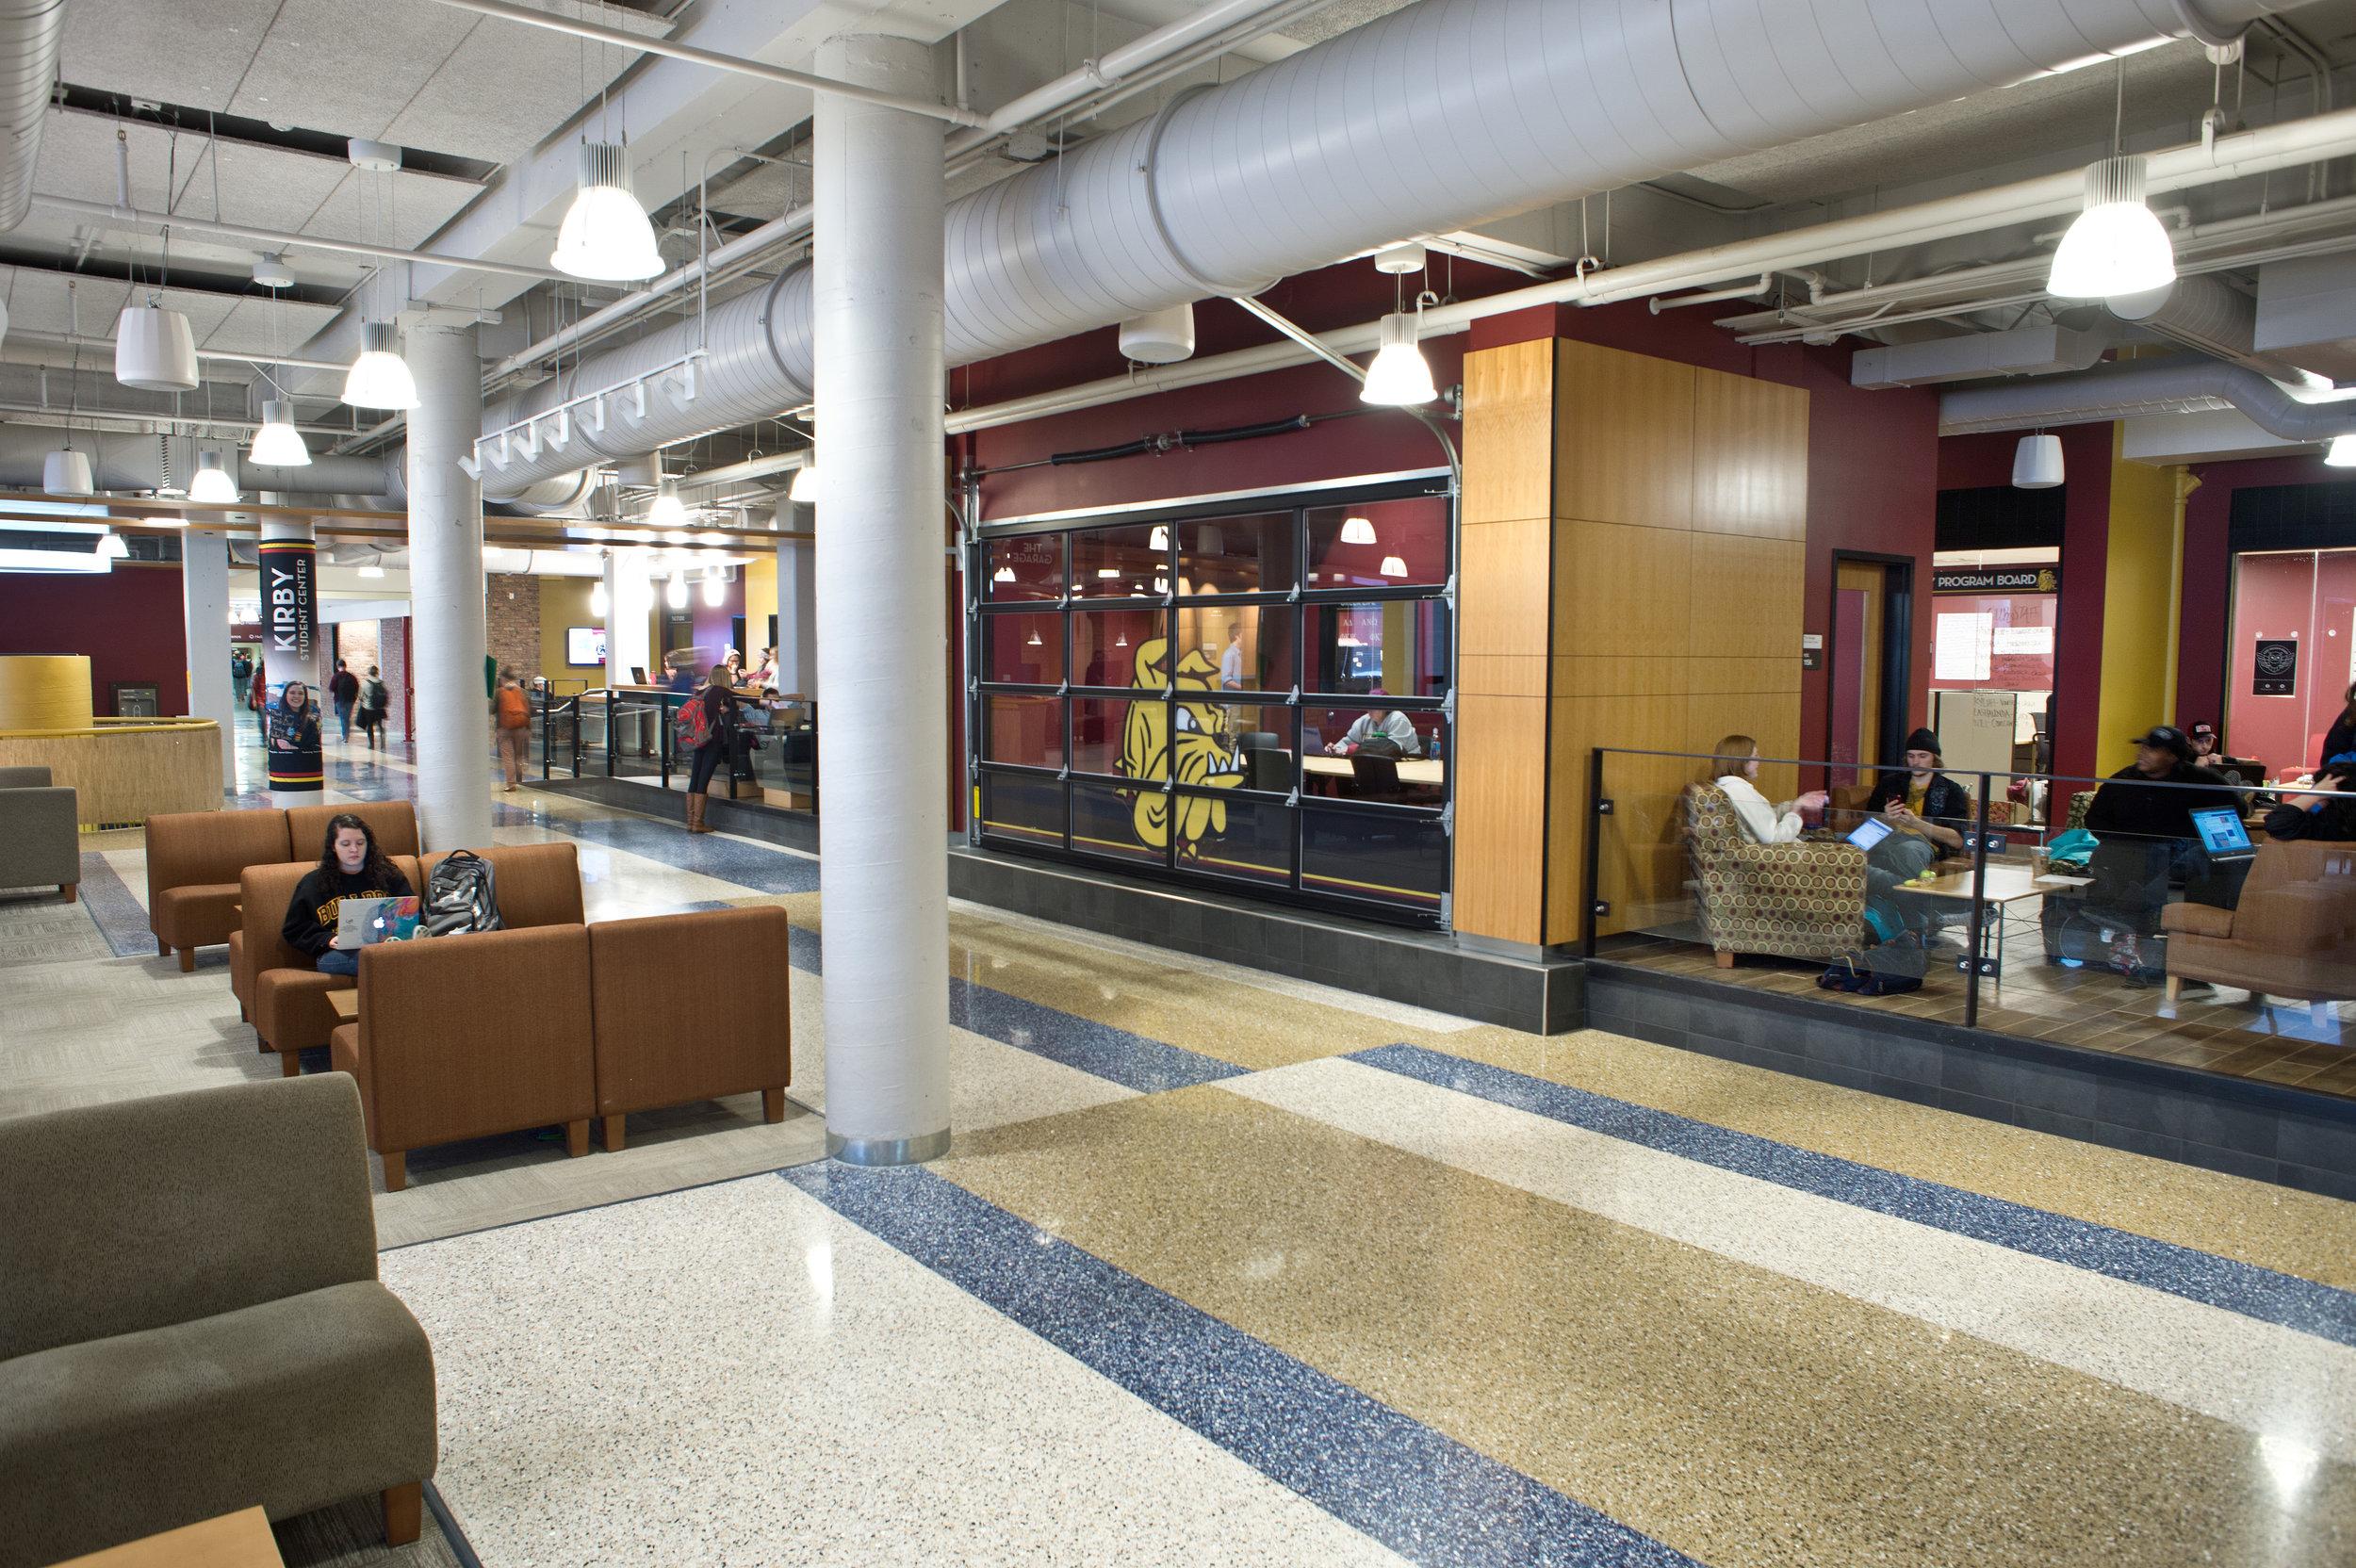 University of Minnesota Duluth Kirby Student Center